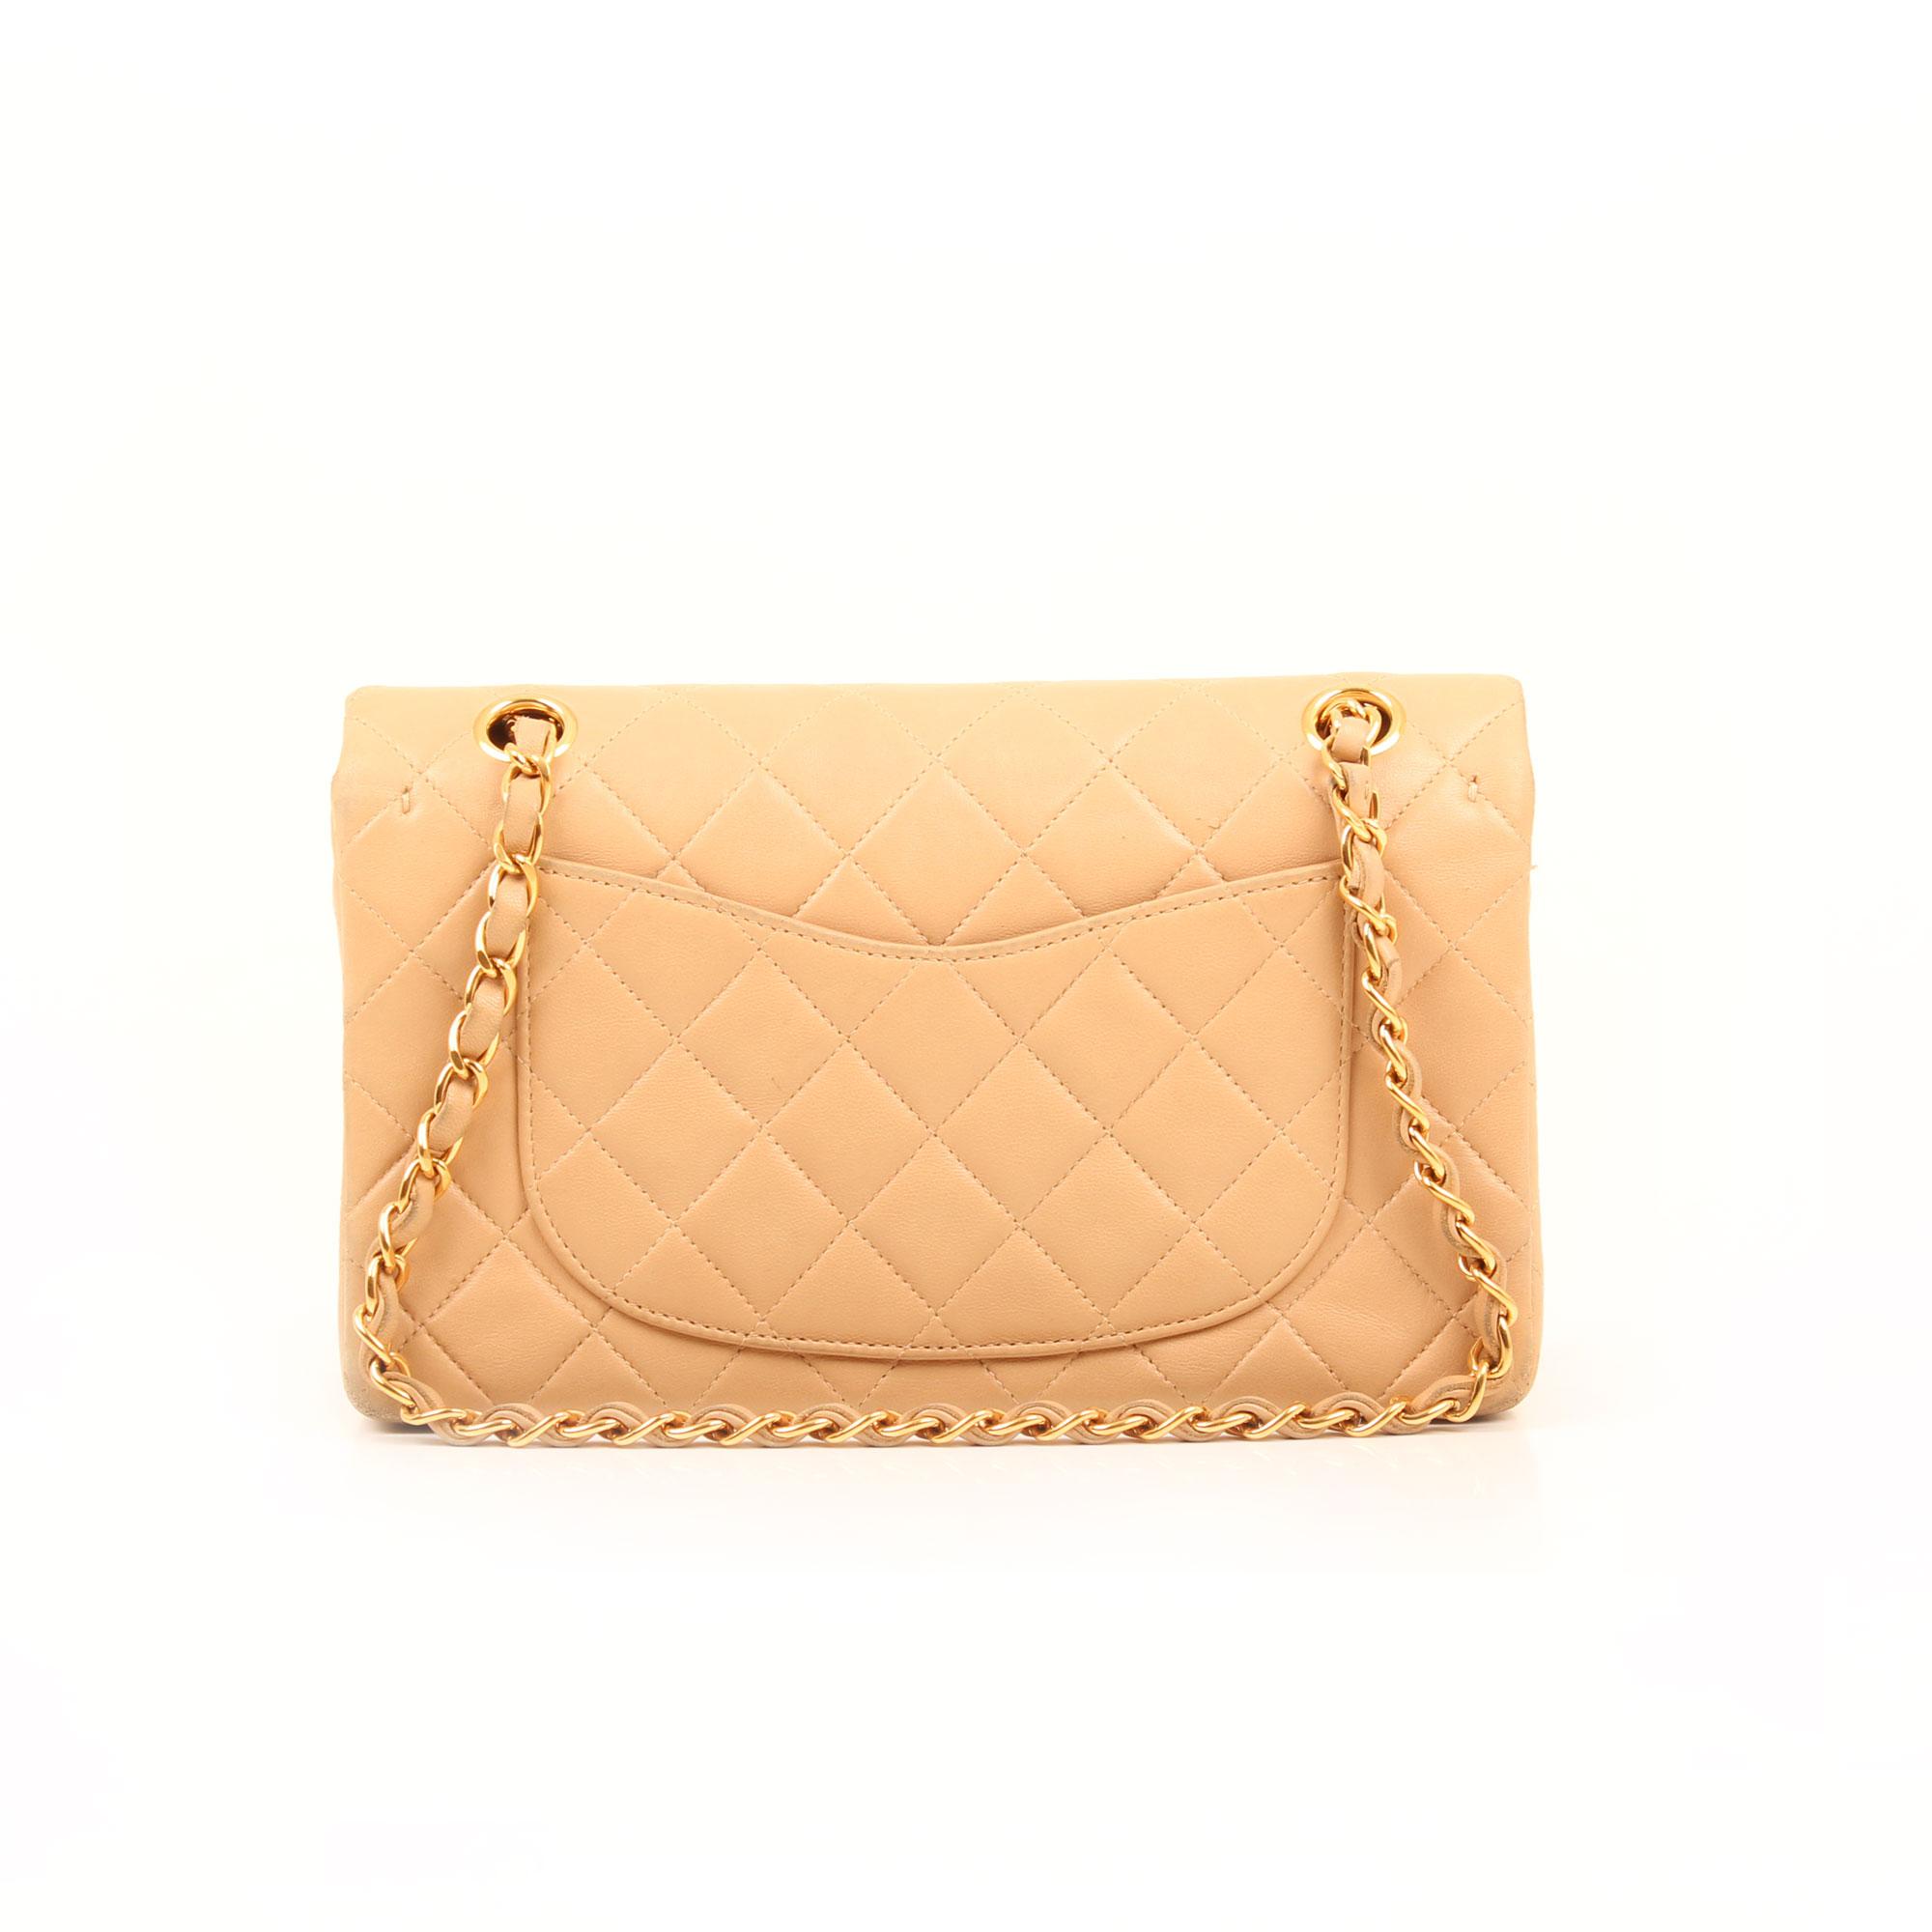 Imagen trasera del bolso chanel classic double flap beige